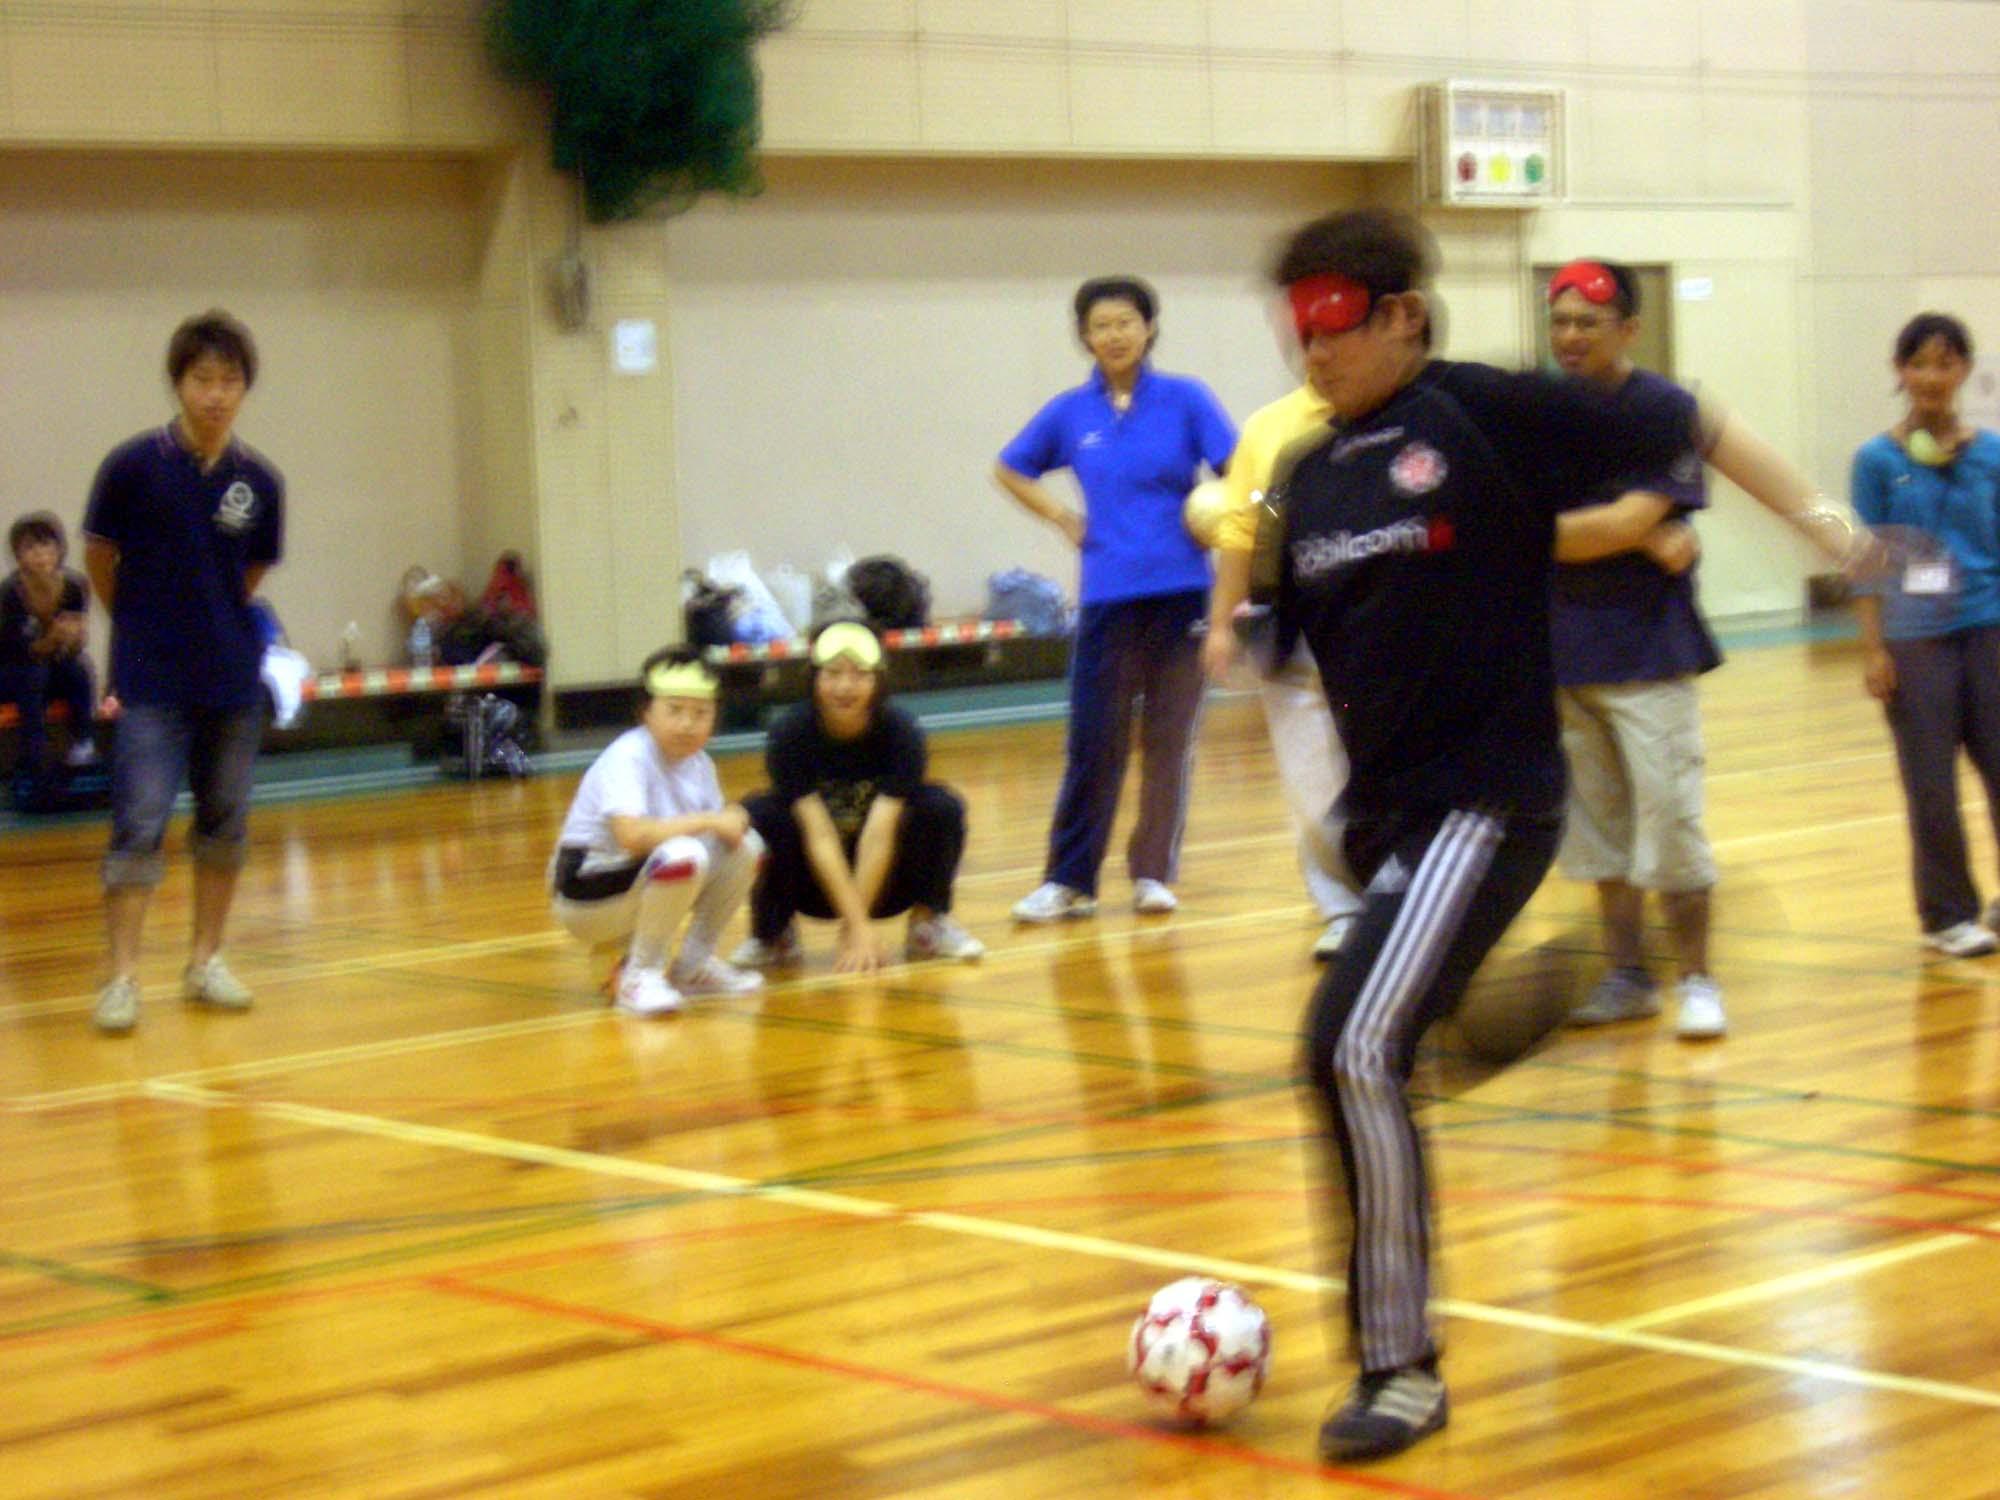 CIMG5486 - 障害者スポーツ体験教室より ・・・ブラインドサッカー、巧みなステップでディフェンスをかわす!